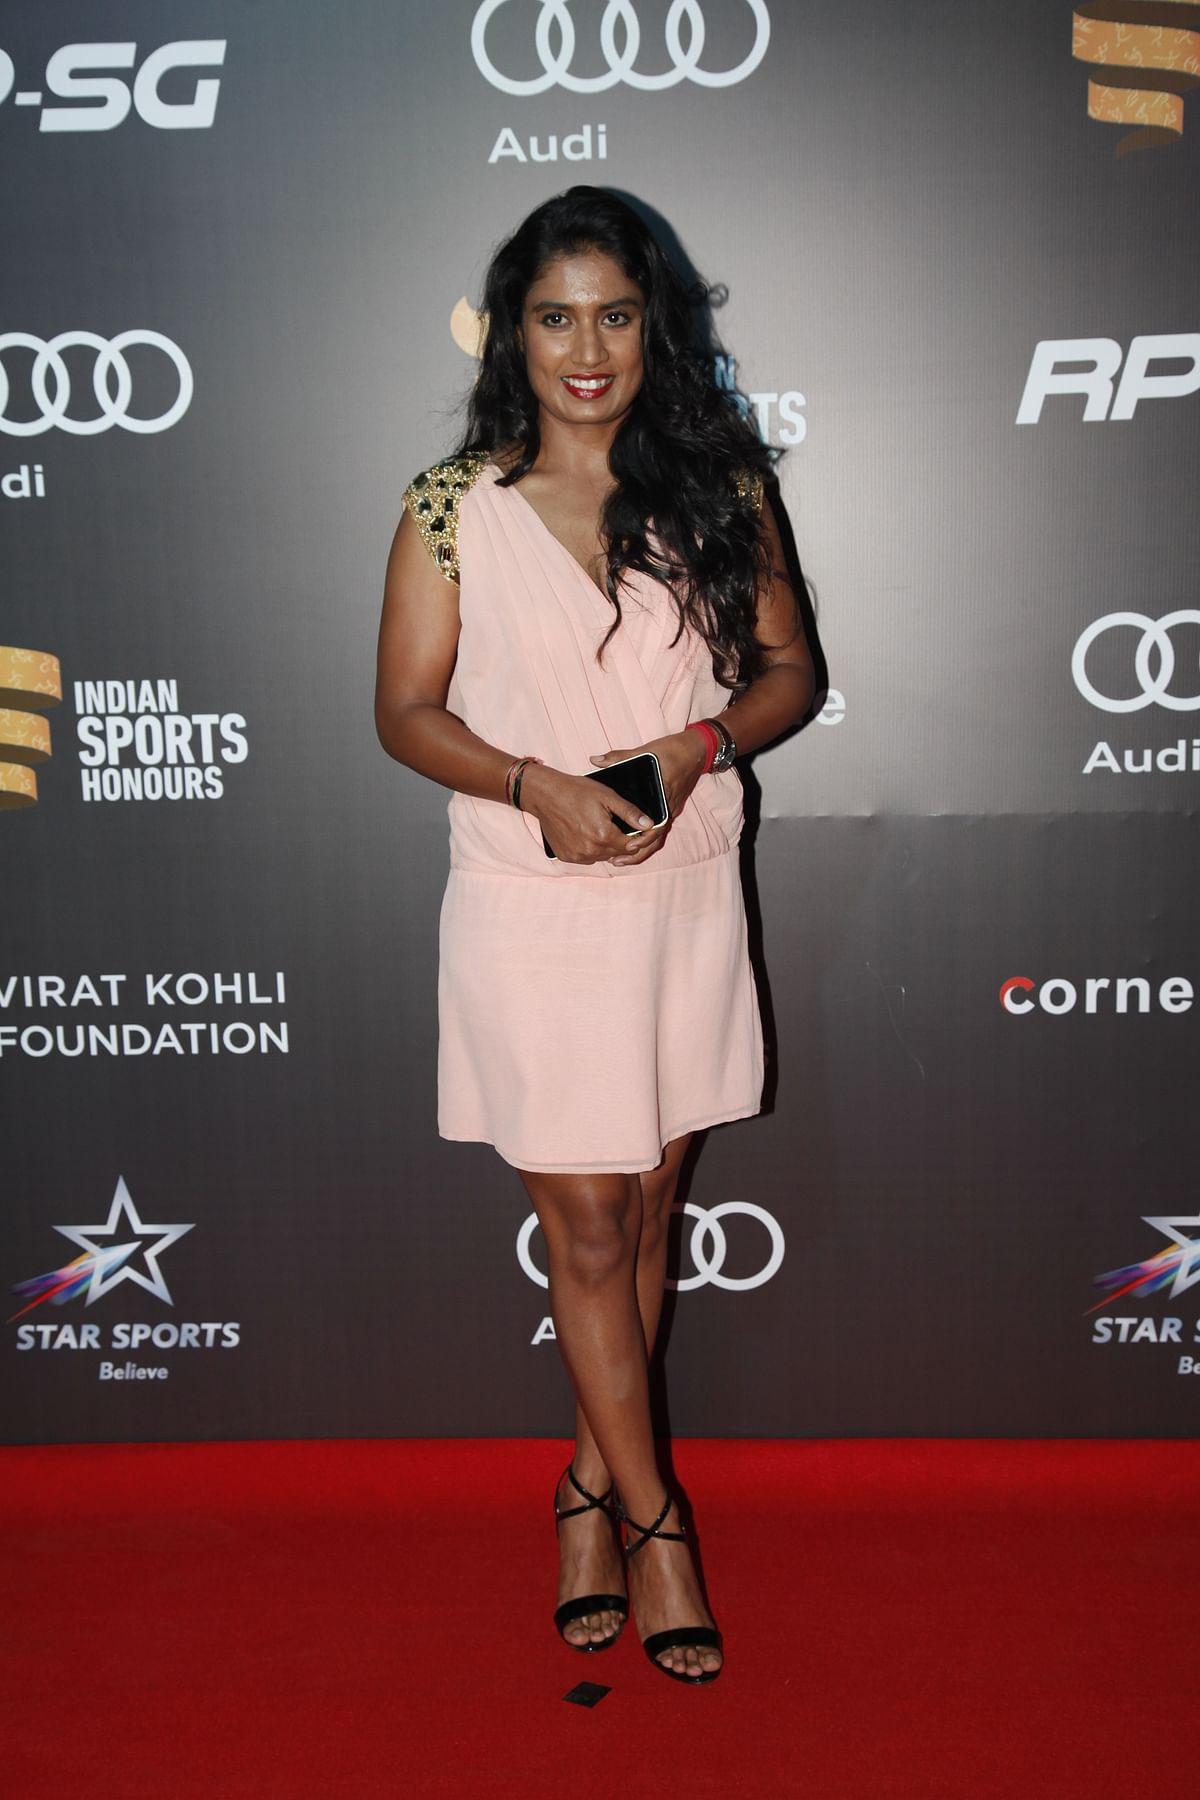 In Pics: Virat, Anushka Fire up Indian Sports Honours Red Carpet